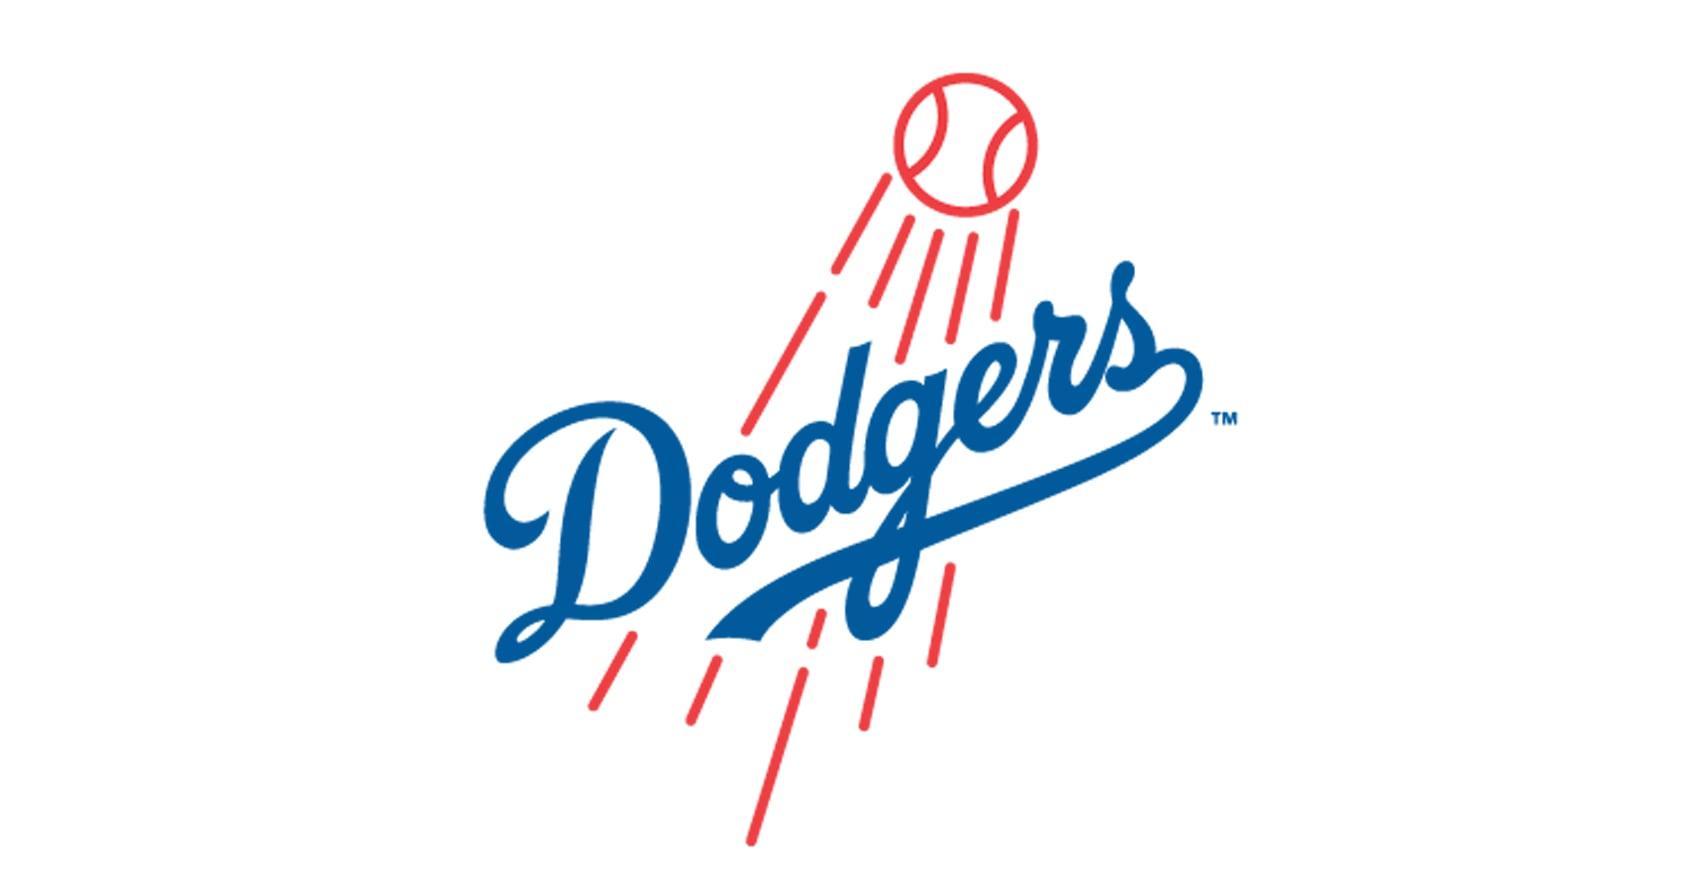 Let's go, Dodgers